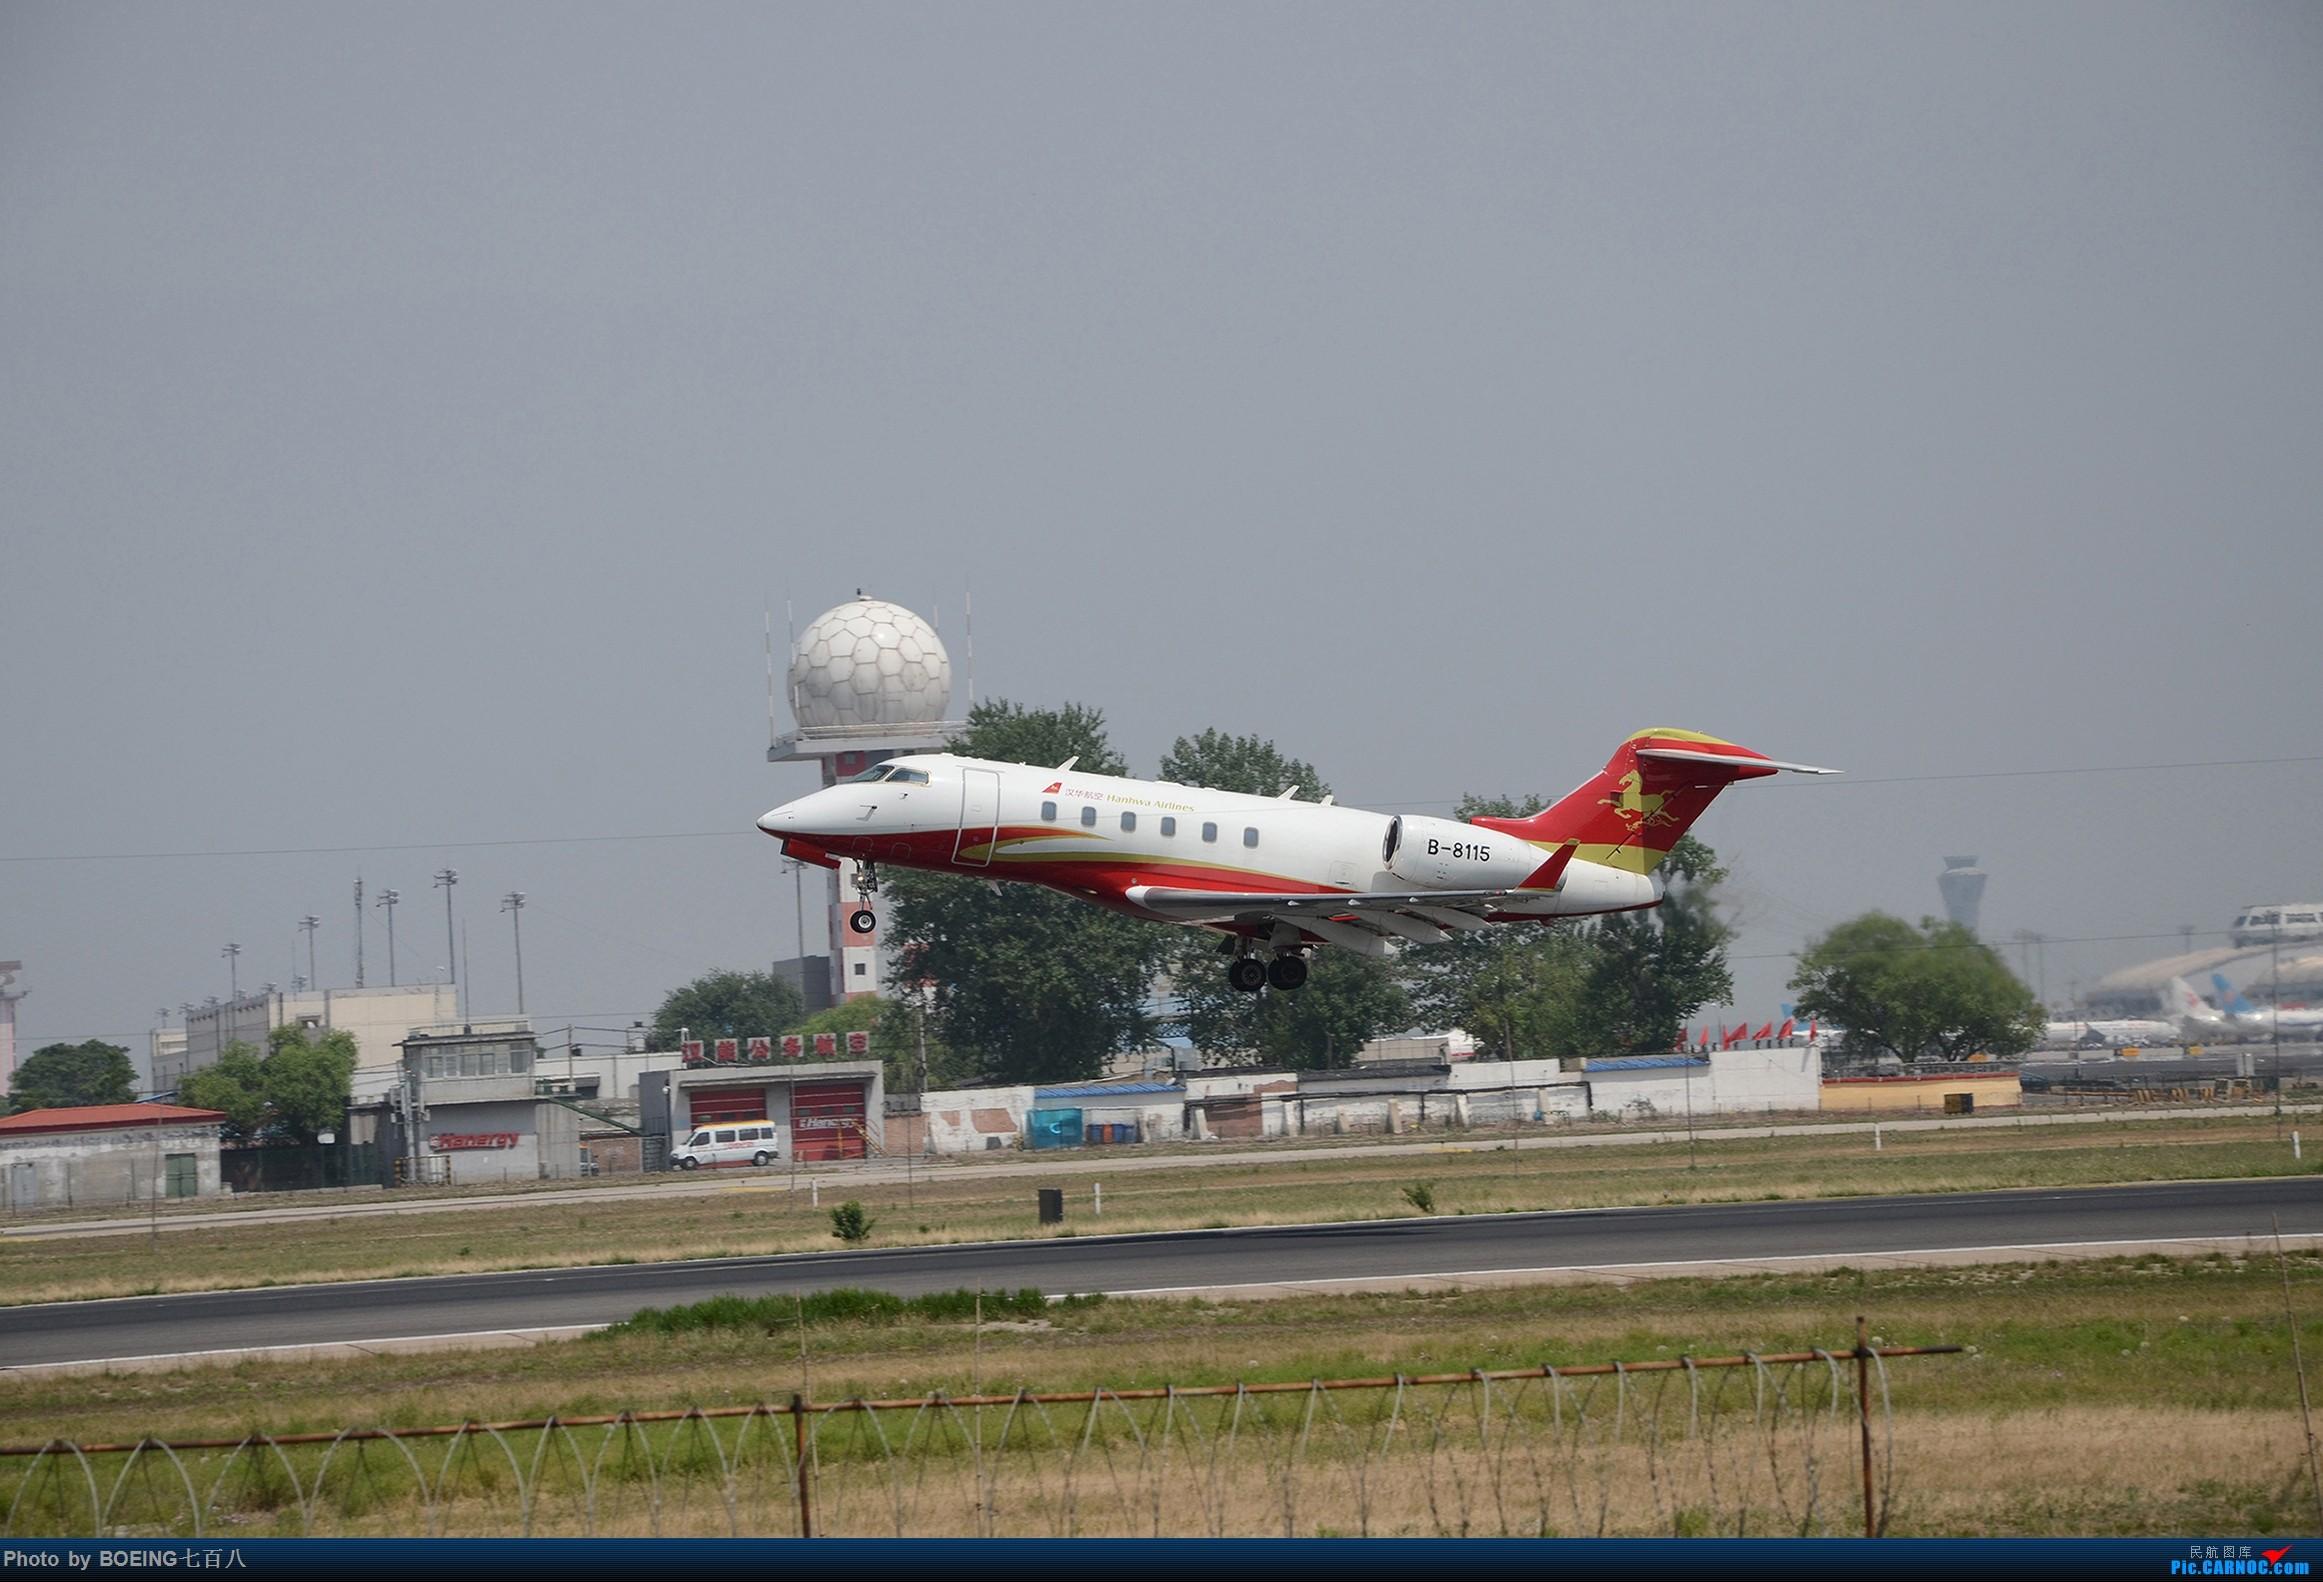 Re:[原创]海航家的黄焖熊猫和清蒸熊猫等好货 BOMBARDIER CL300 B-8115 中国北京首都国际机场